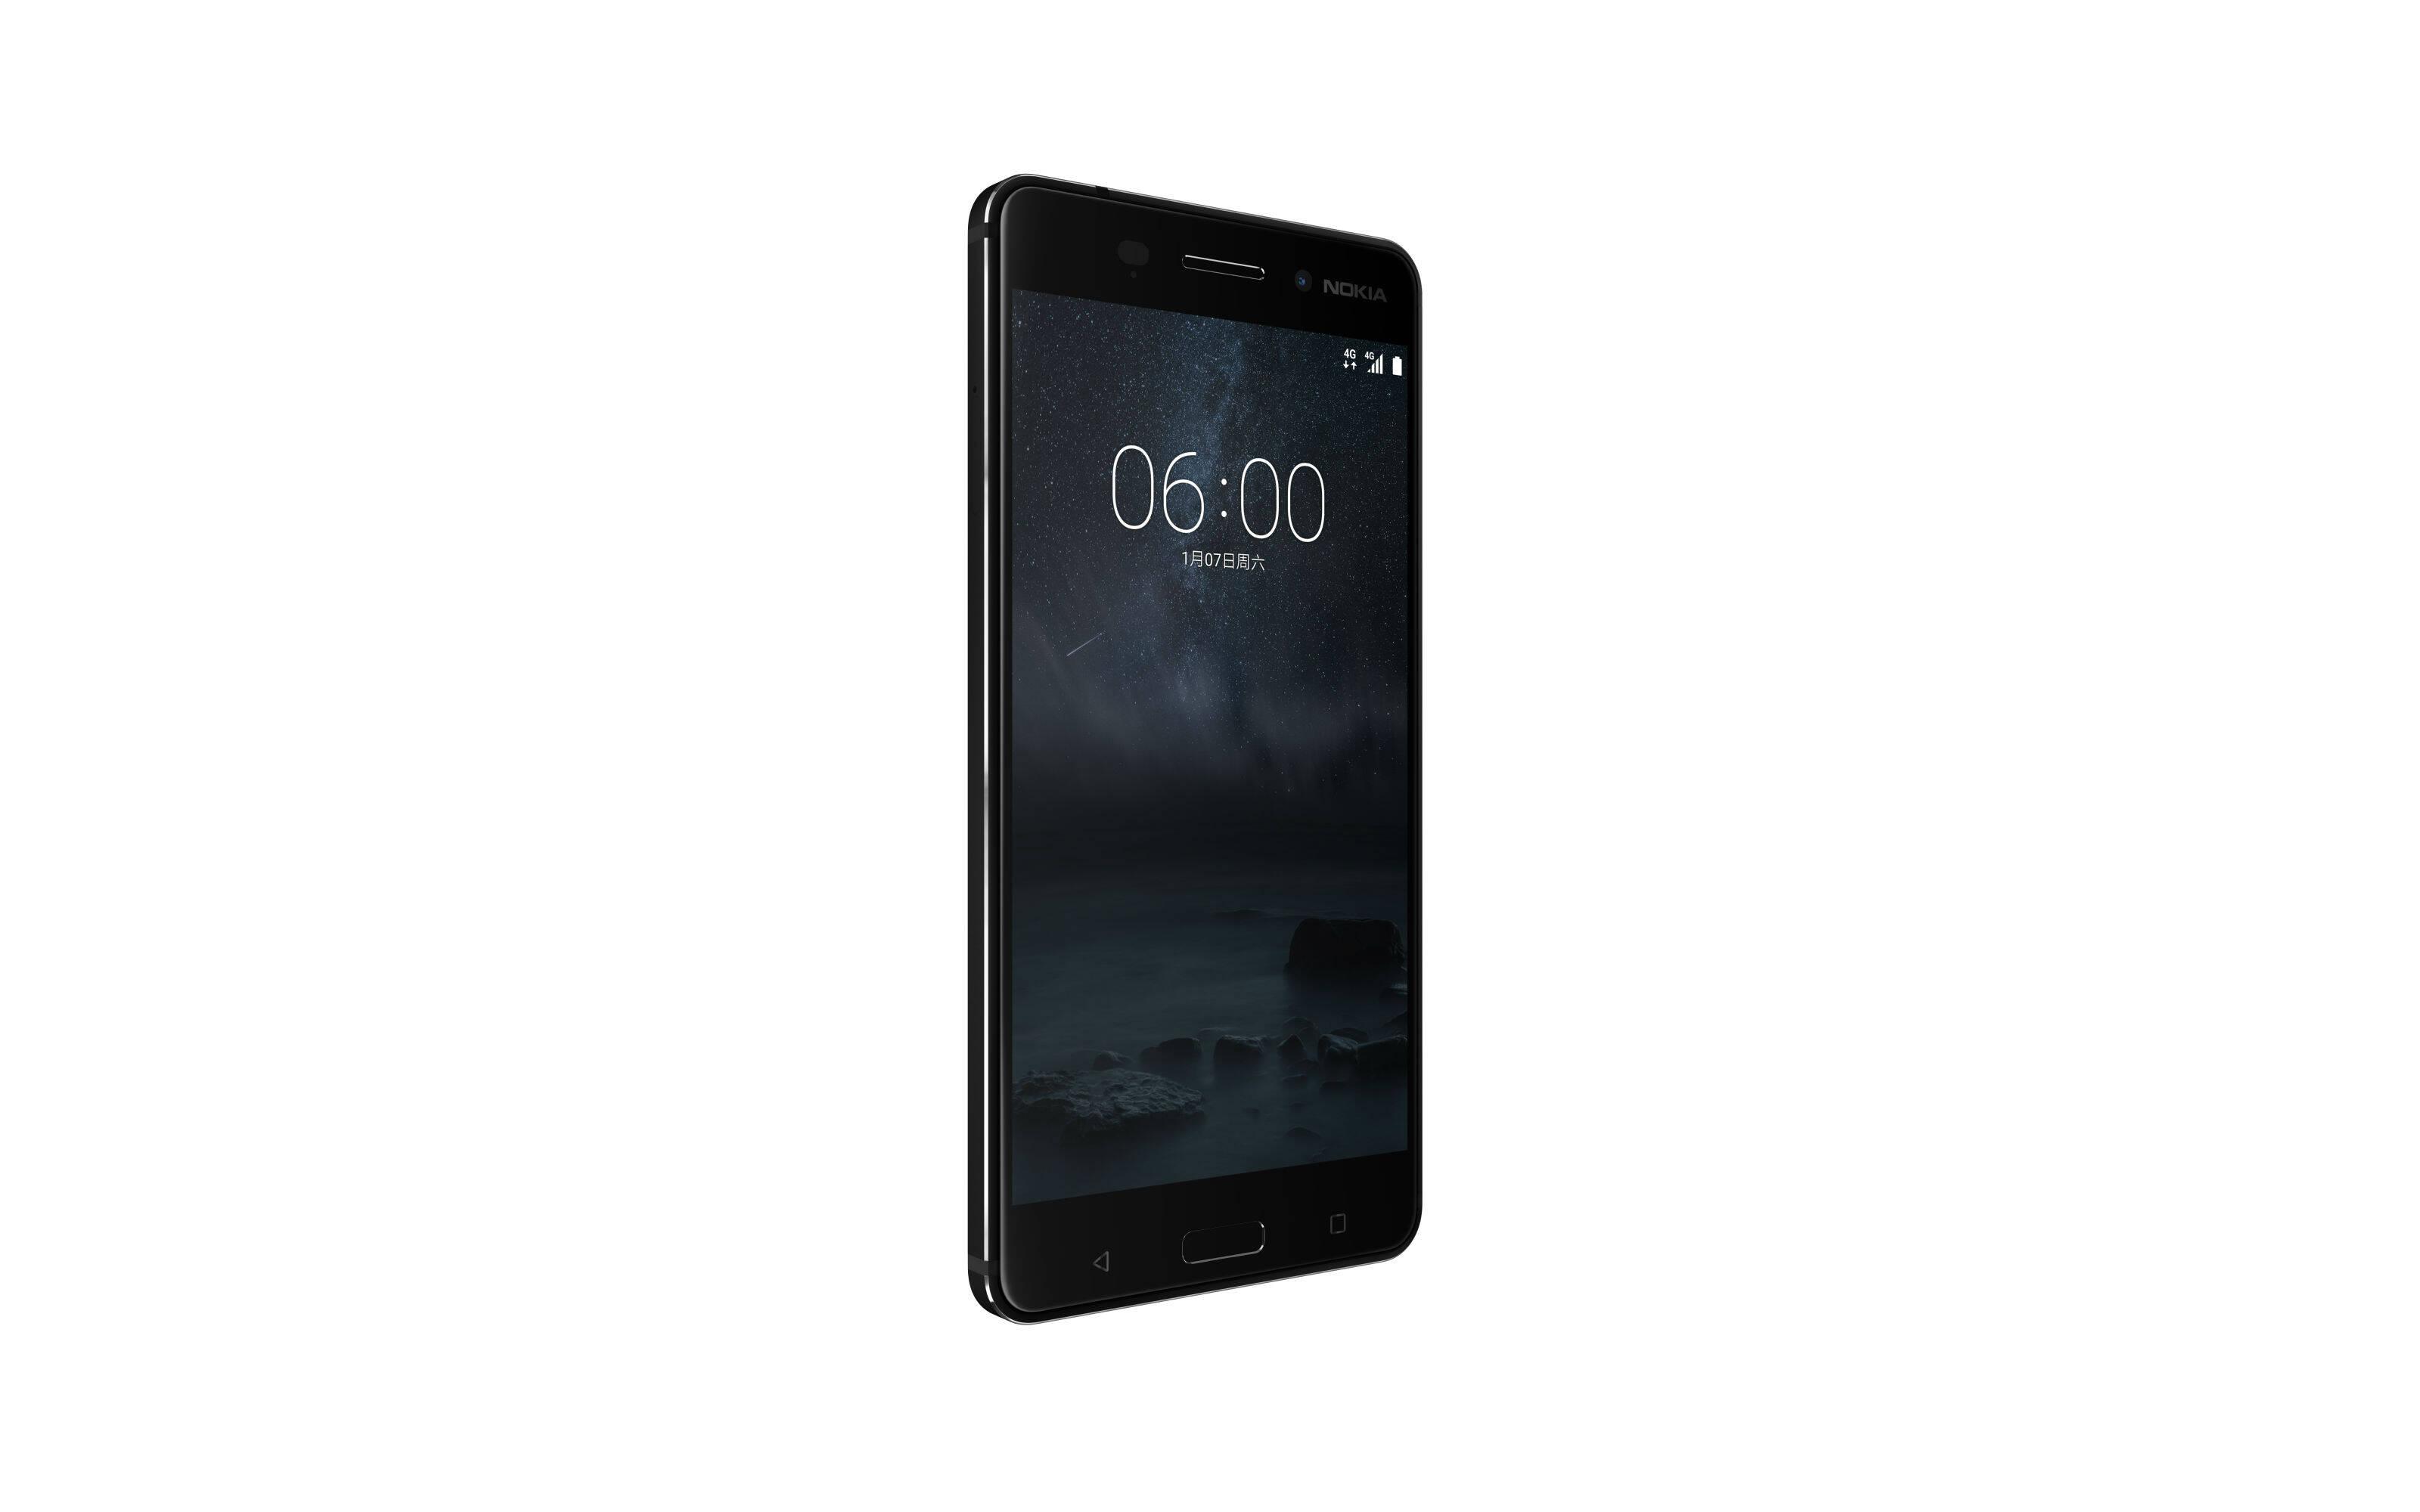 Smartphone tem display IPS LCD de 5,5 polegadas com resolução Full HD (1.920 x 1.080 pixels). Foto: Divulgação